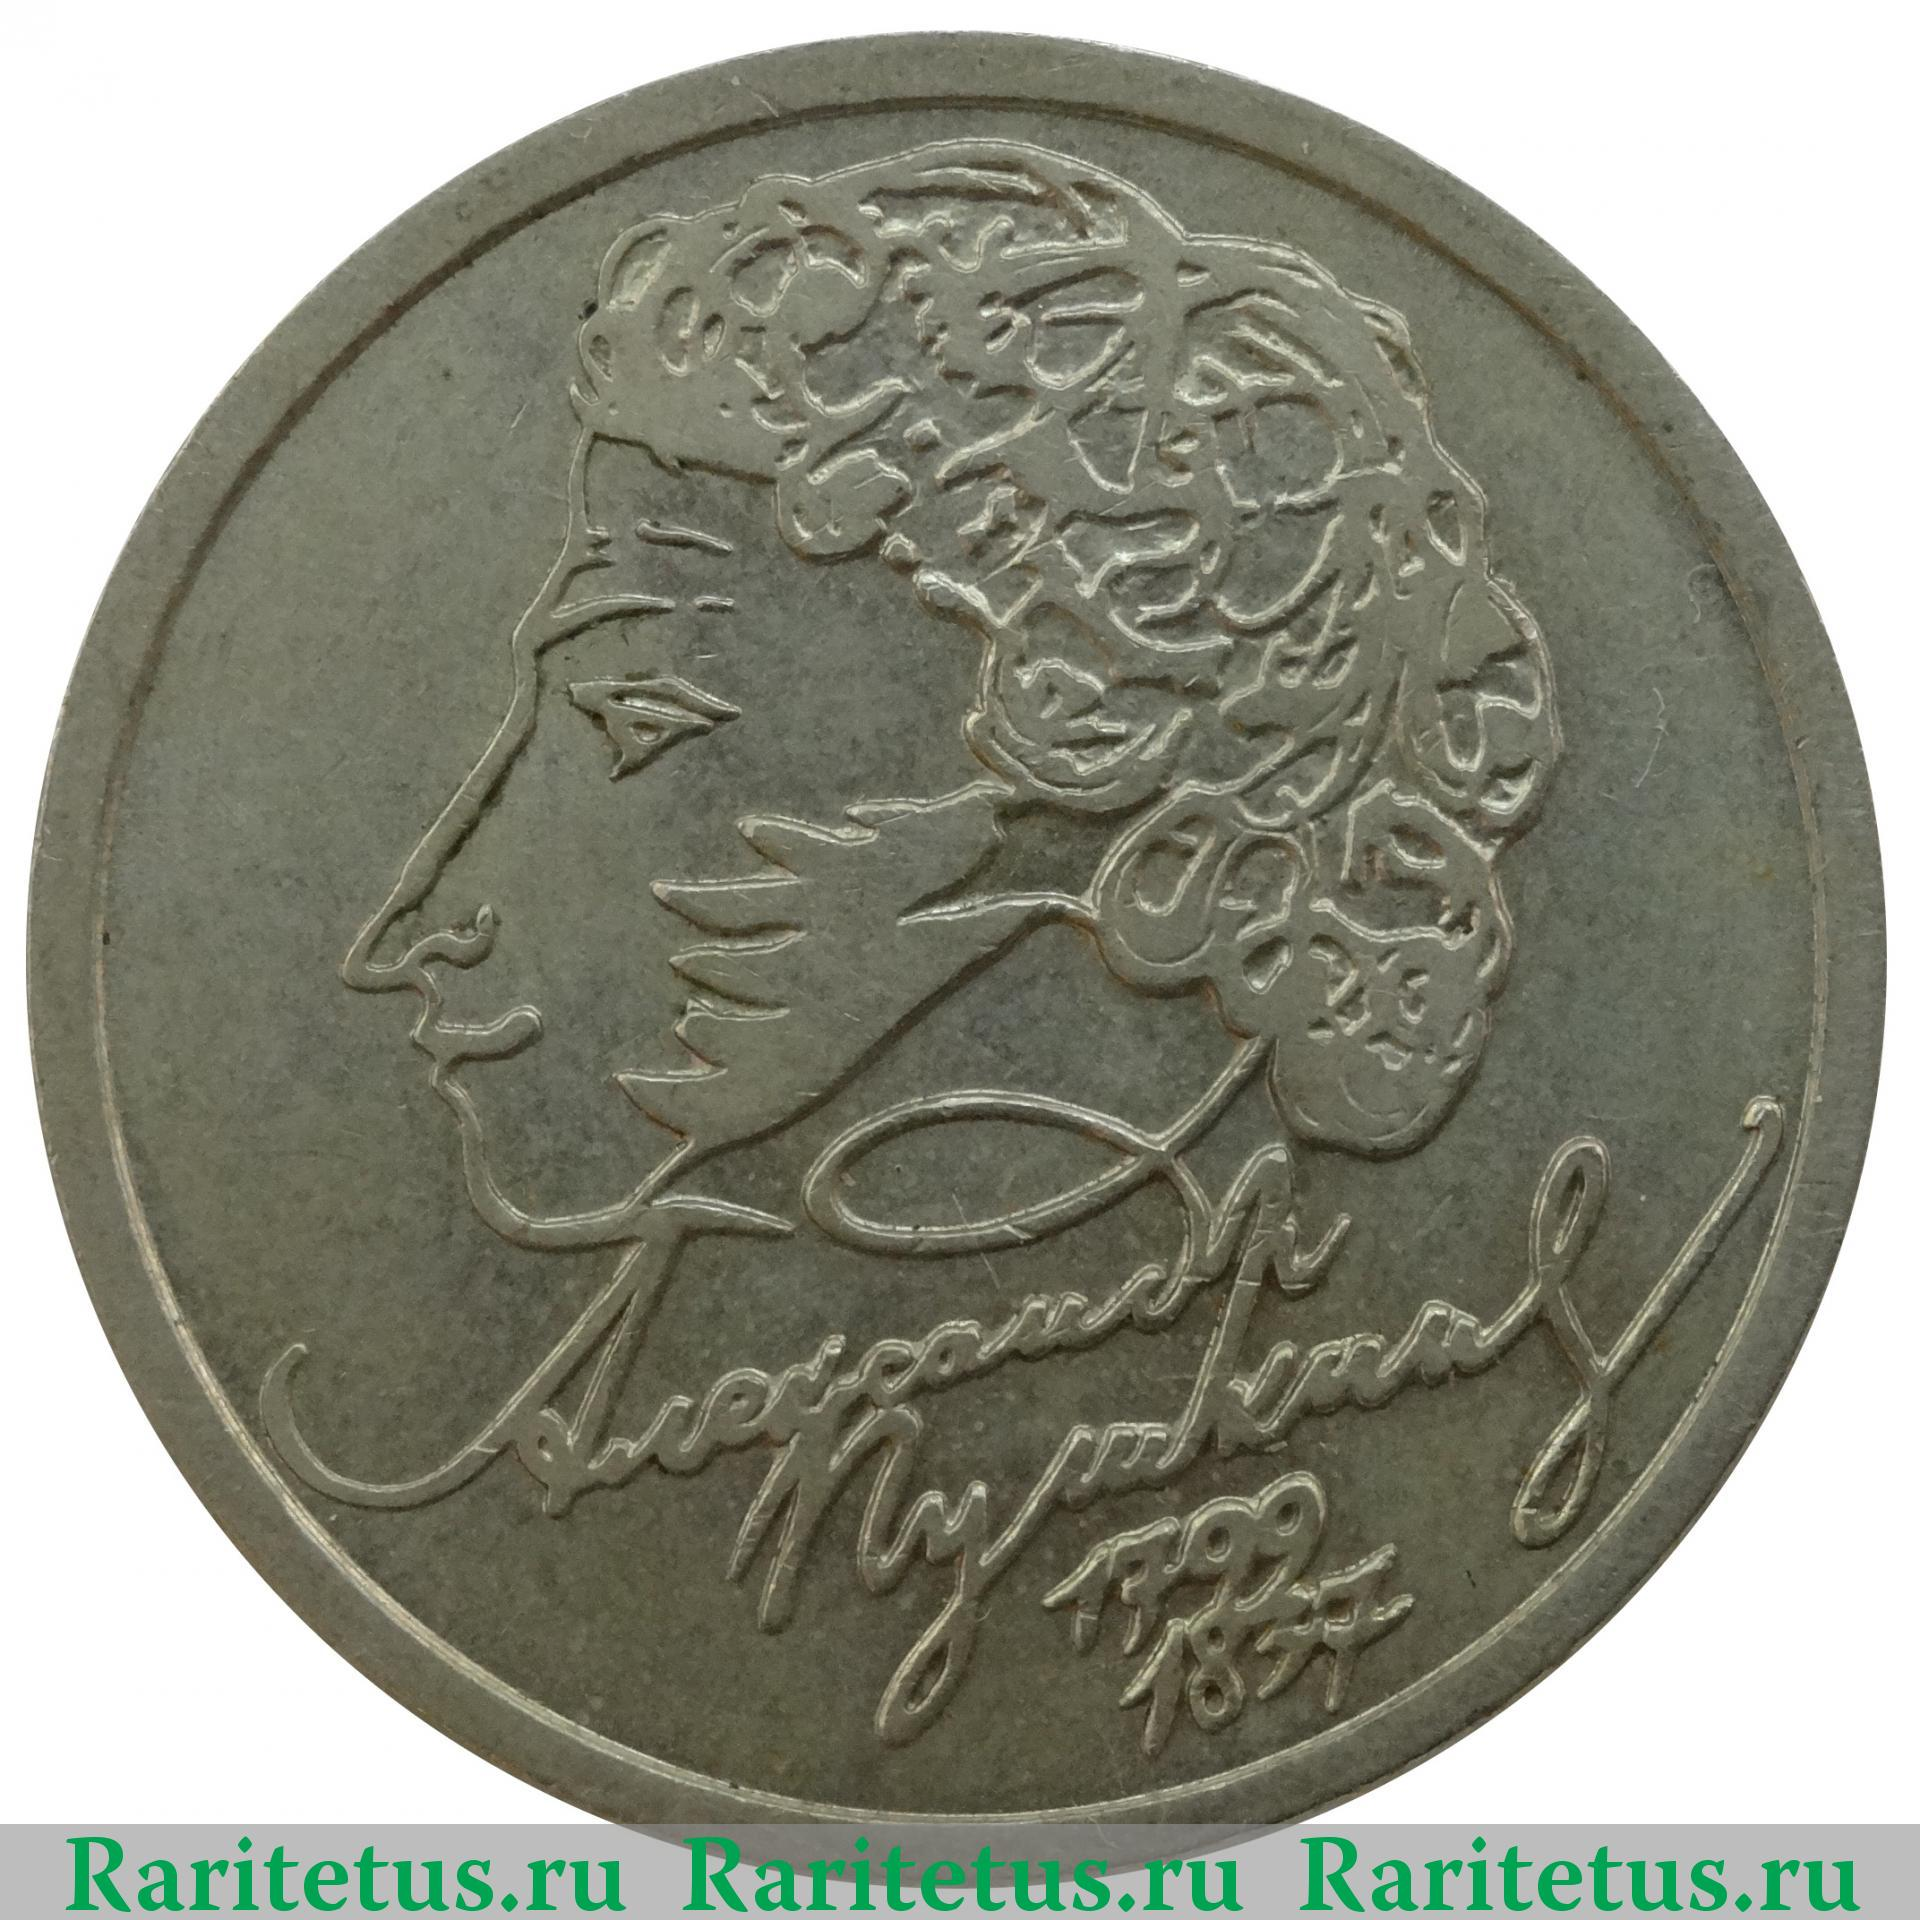 Сколько стоит монета пушкина 1999 года исторические области испании карта